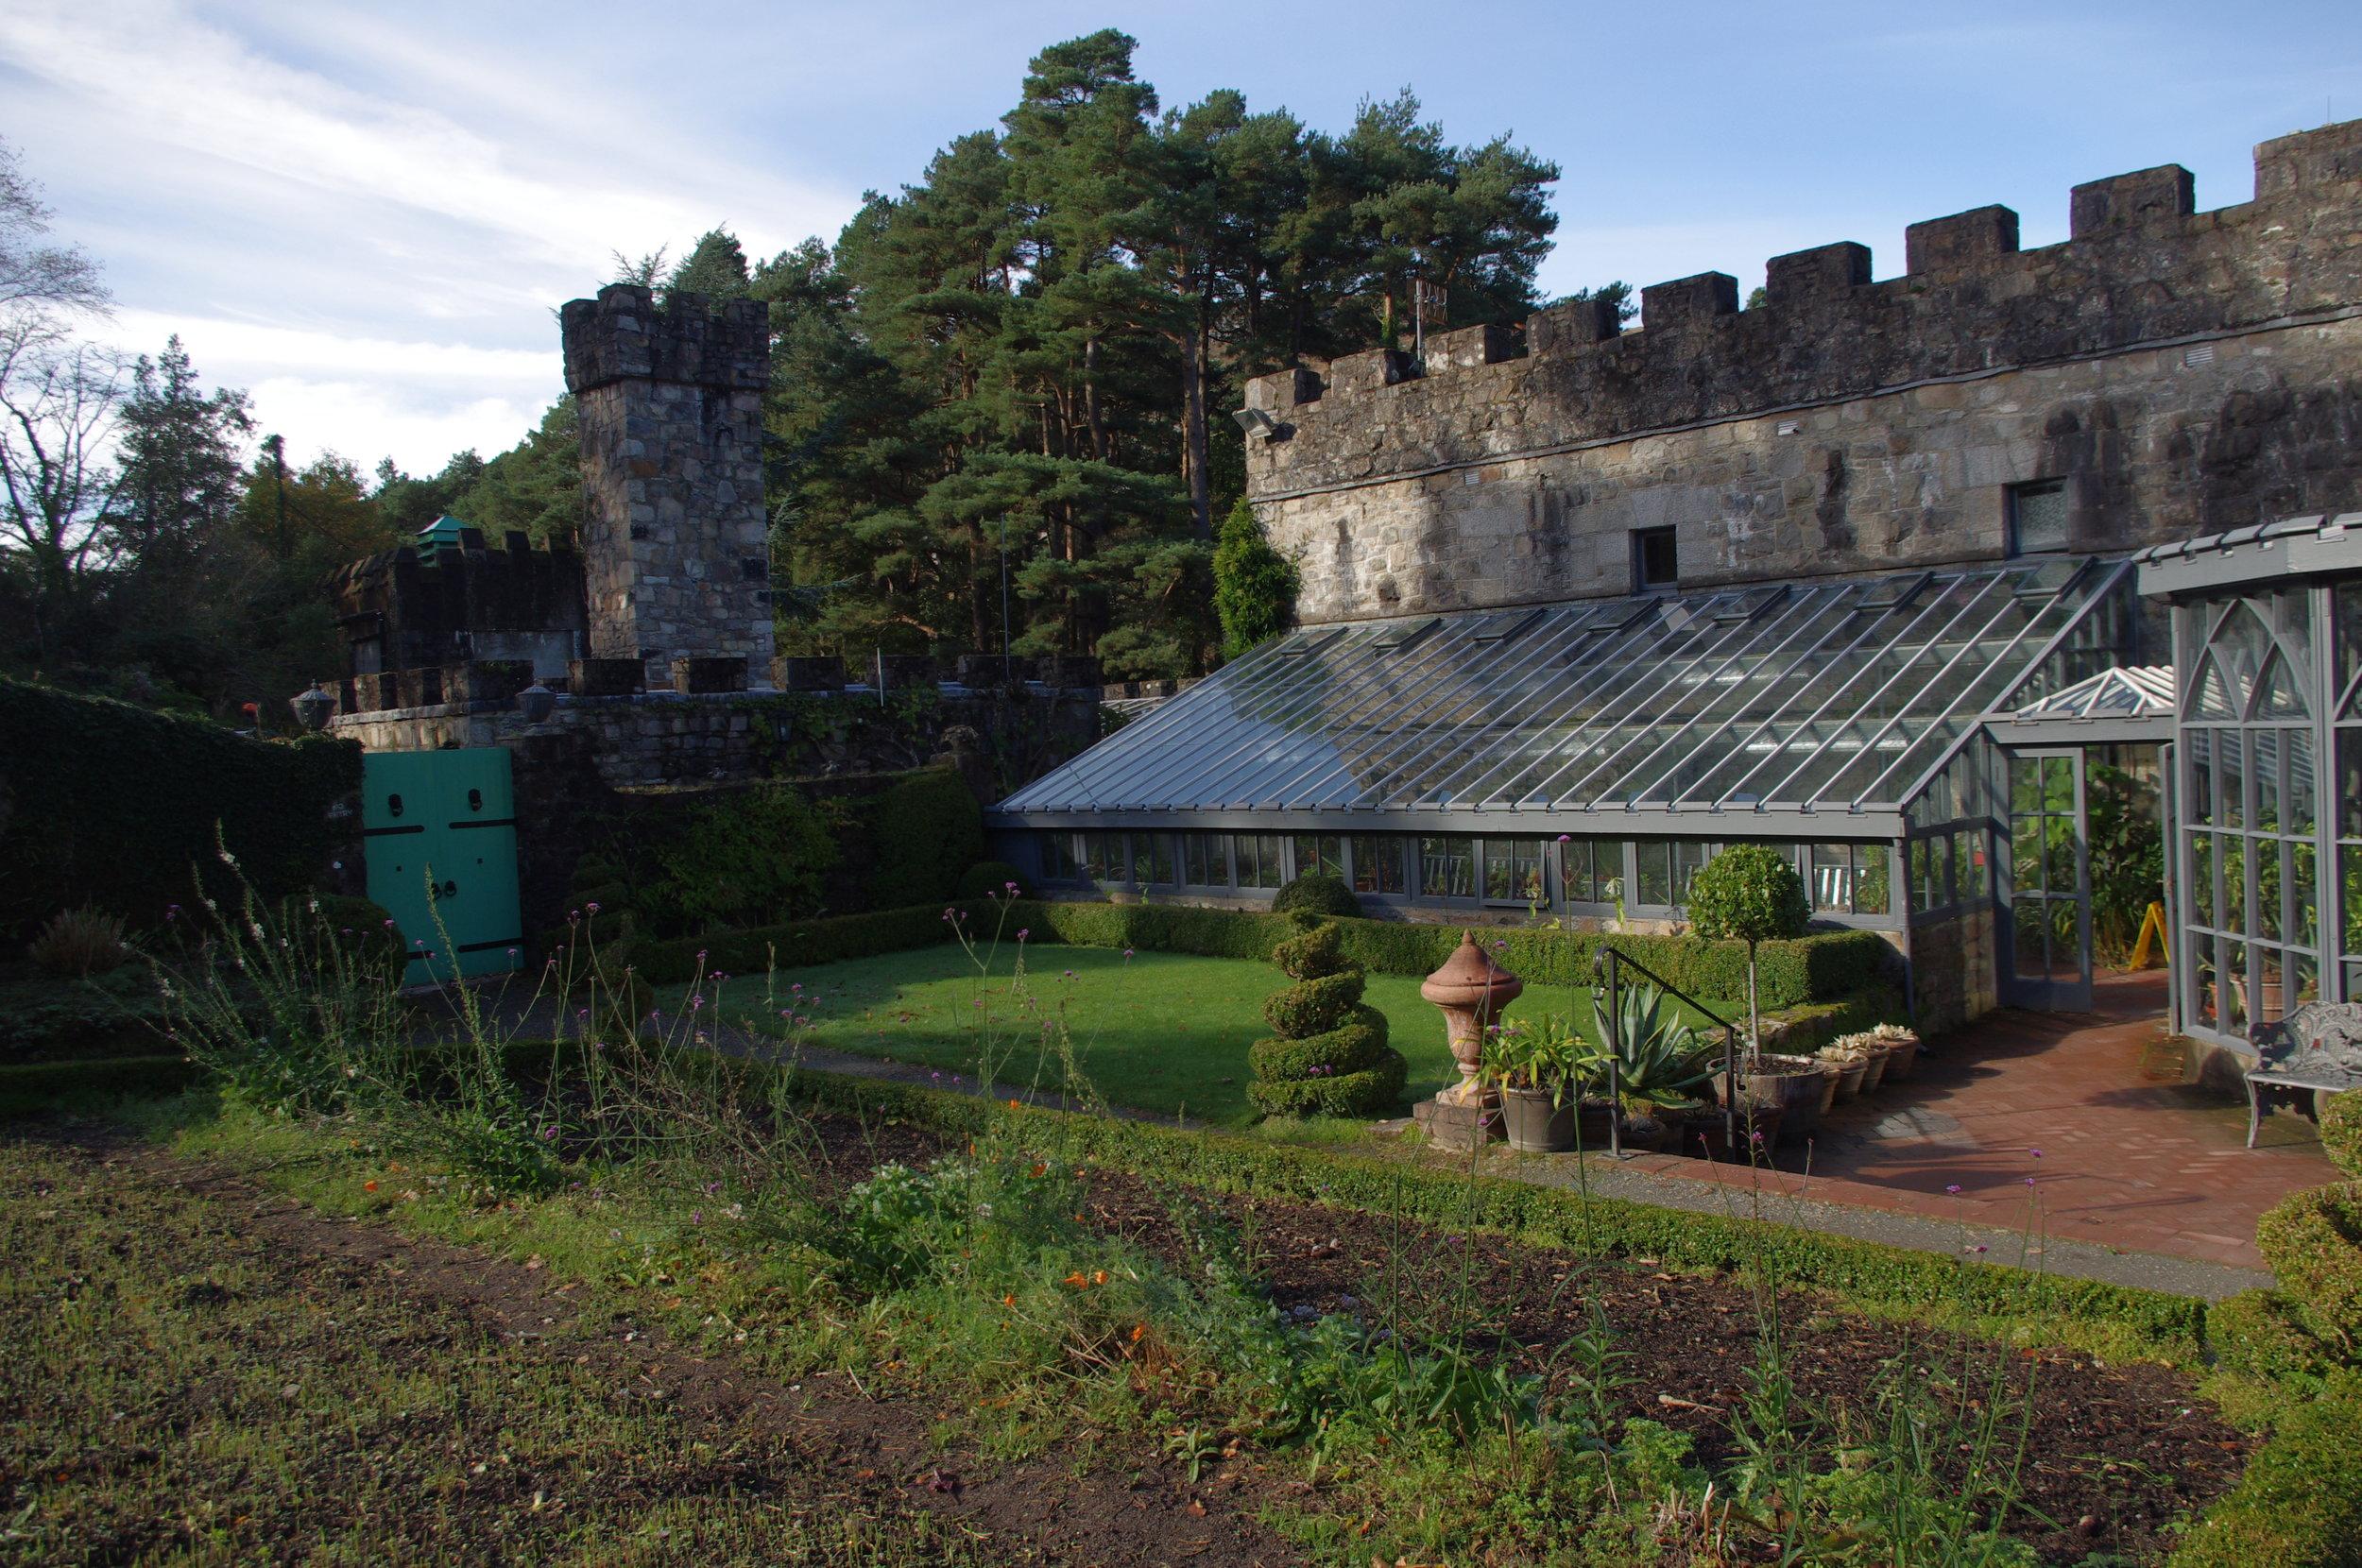 Glenveagh Castle, Letterkenny, Donegal